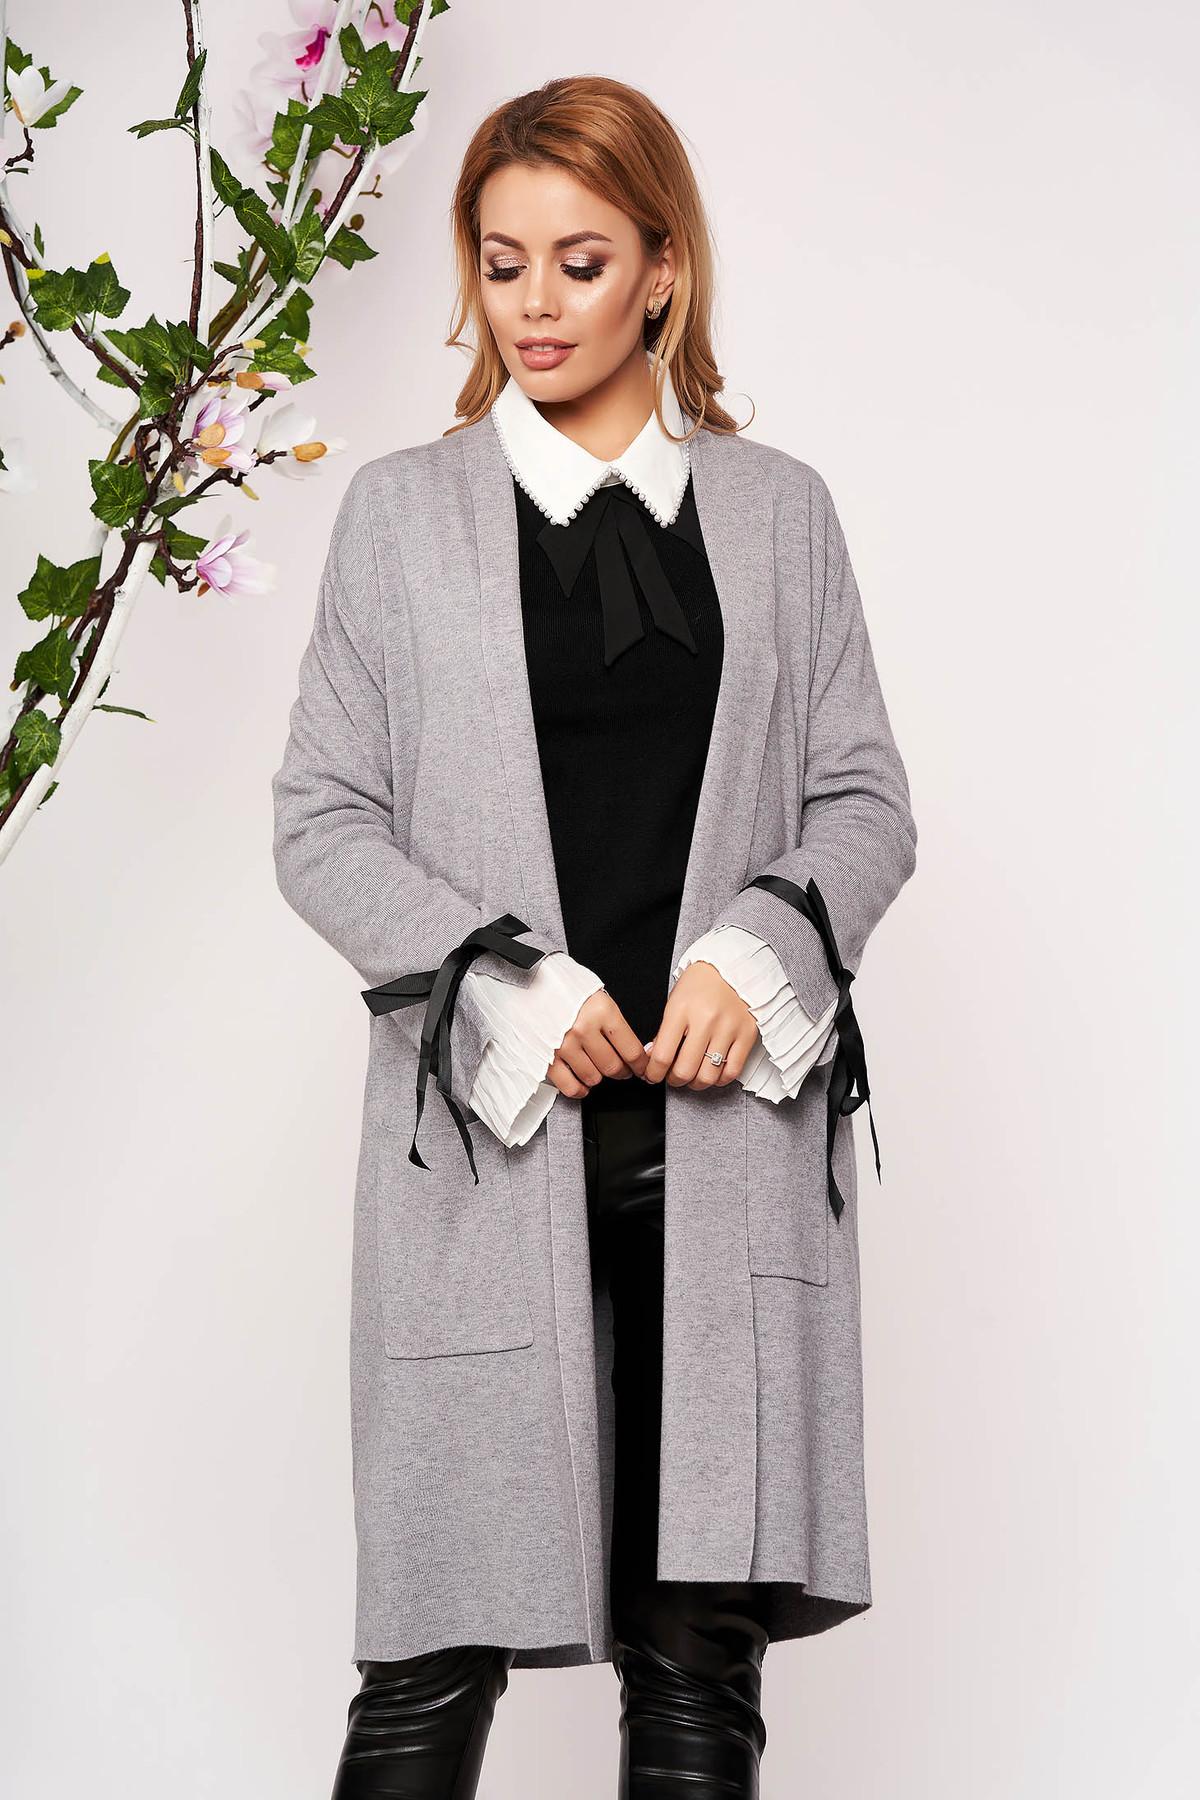 Cardigan SunShine gri elegant lung tricotat accesorizat cu fundite fara captuseala cu buzunare in fata